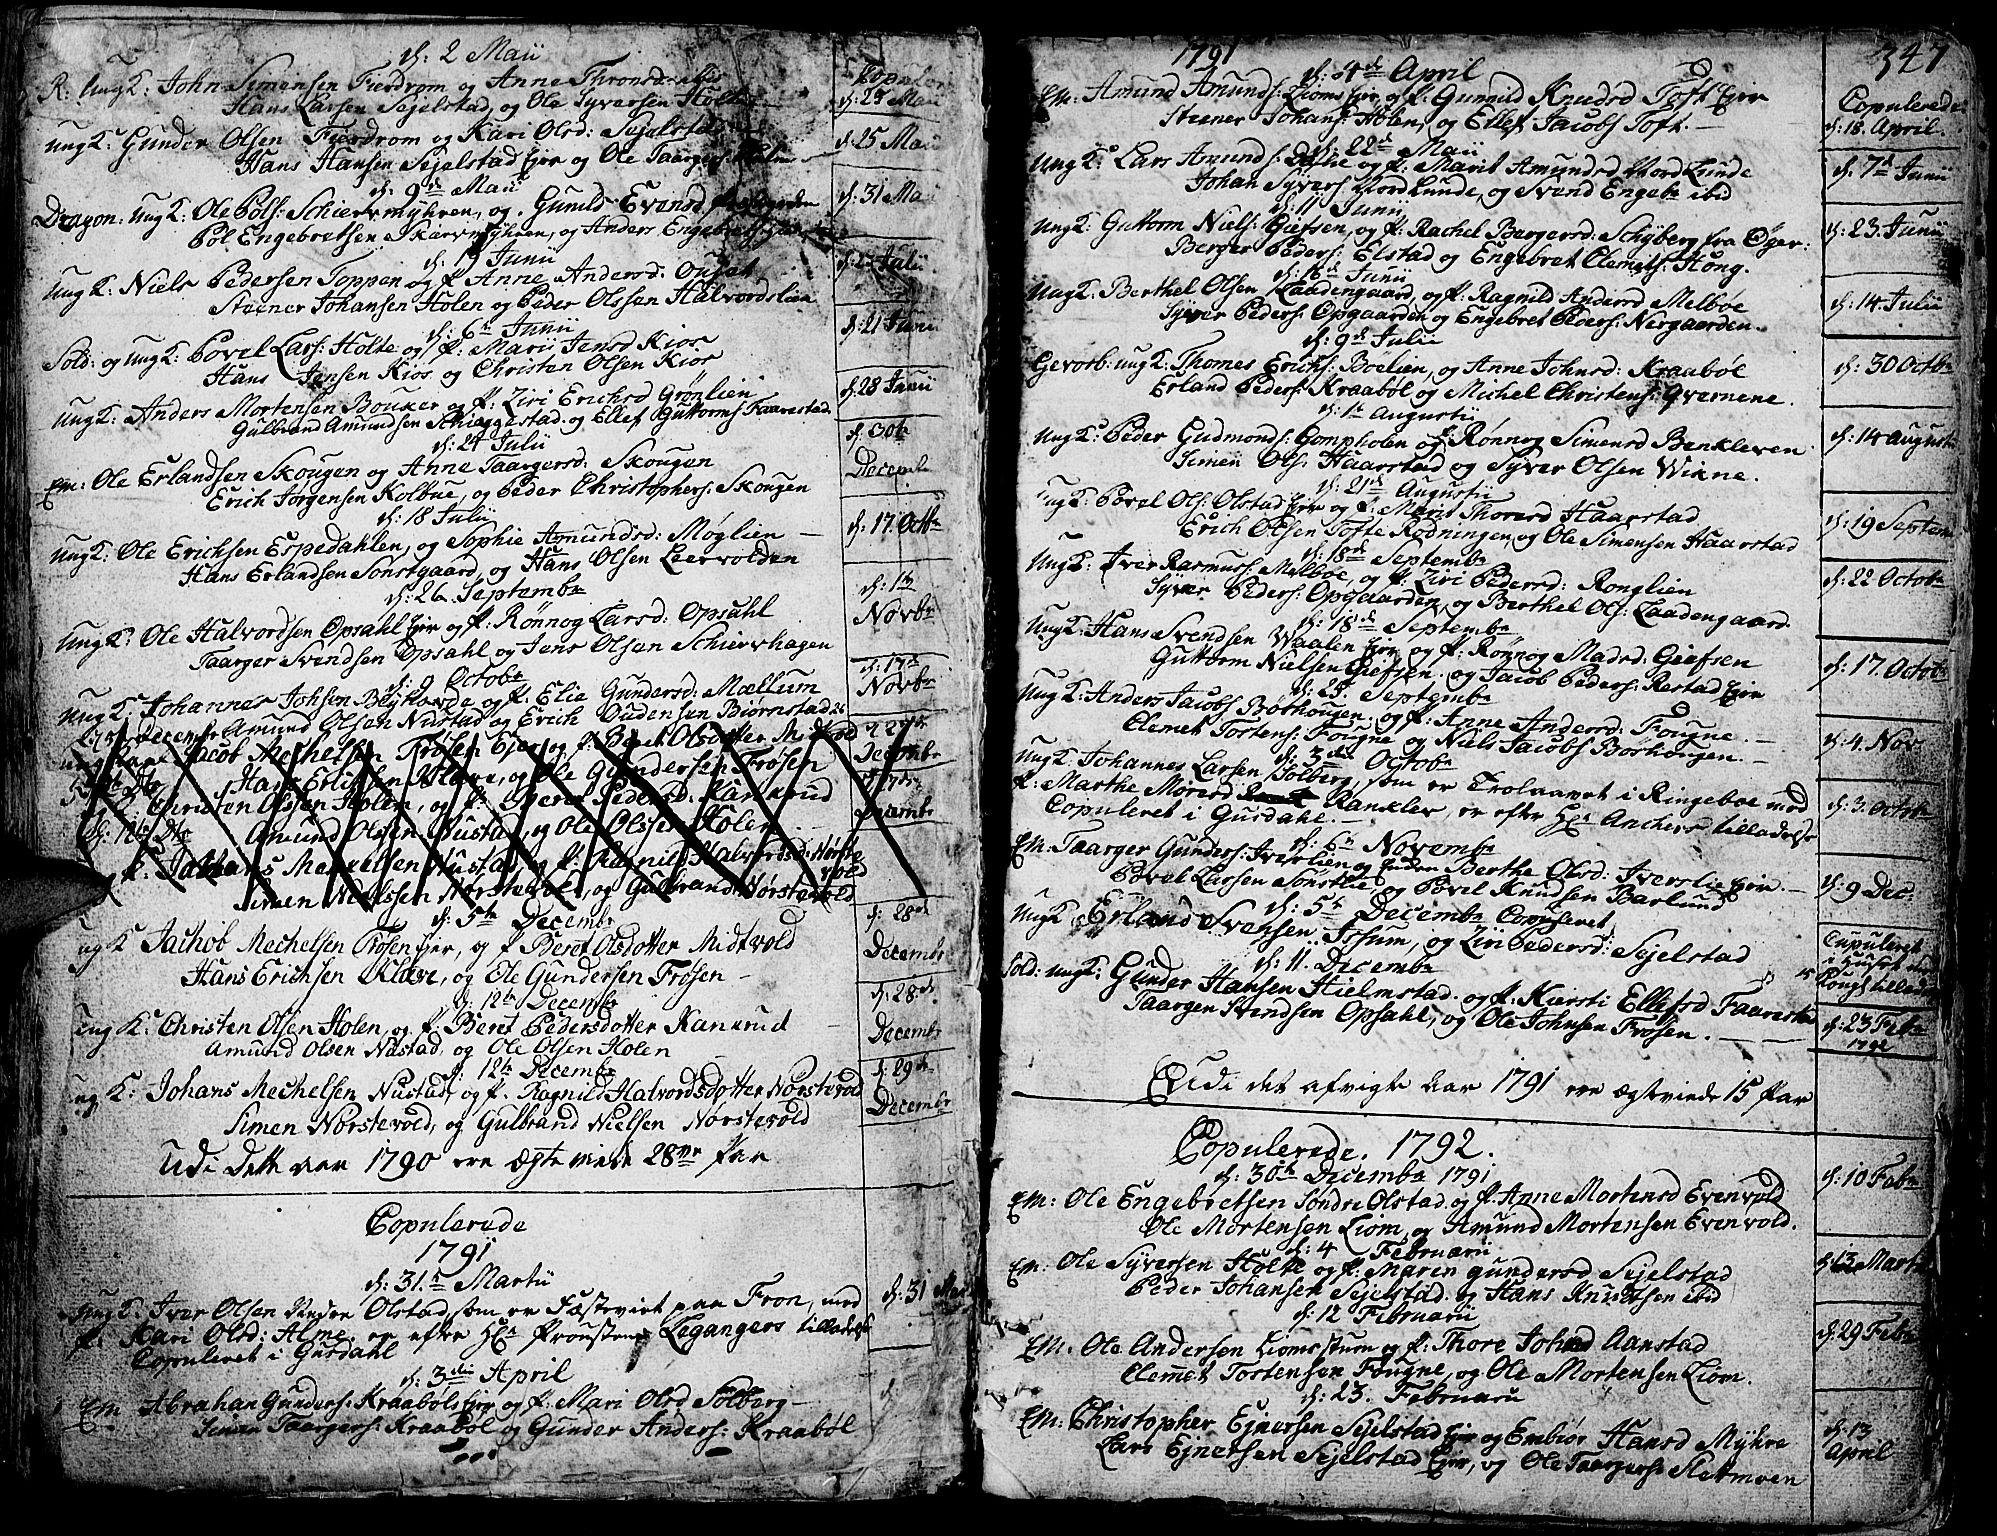 SAH, Gausdal prestekontor, Ministerialbok nr. 3, 1758-1809, s. 347